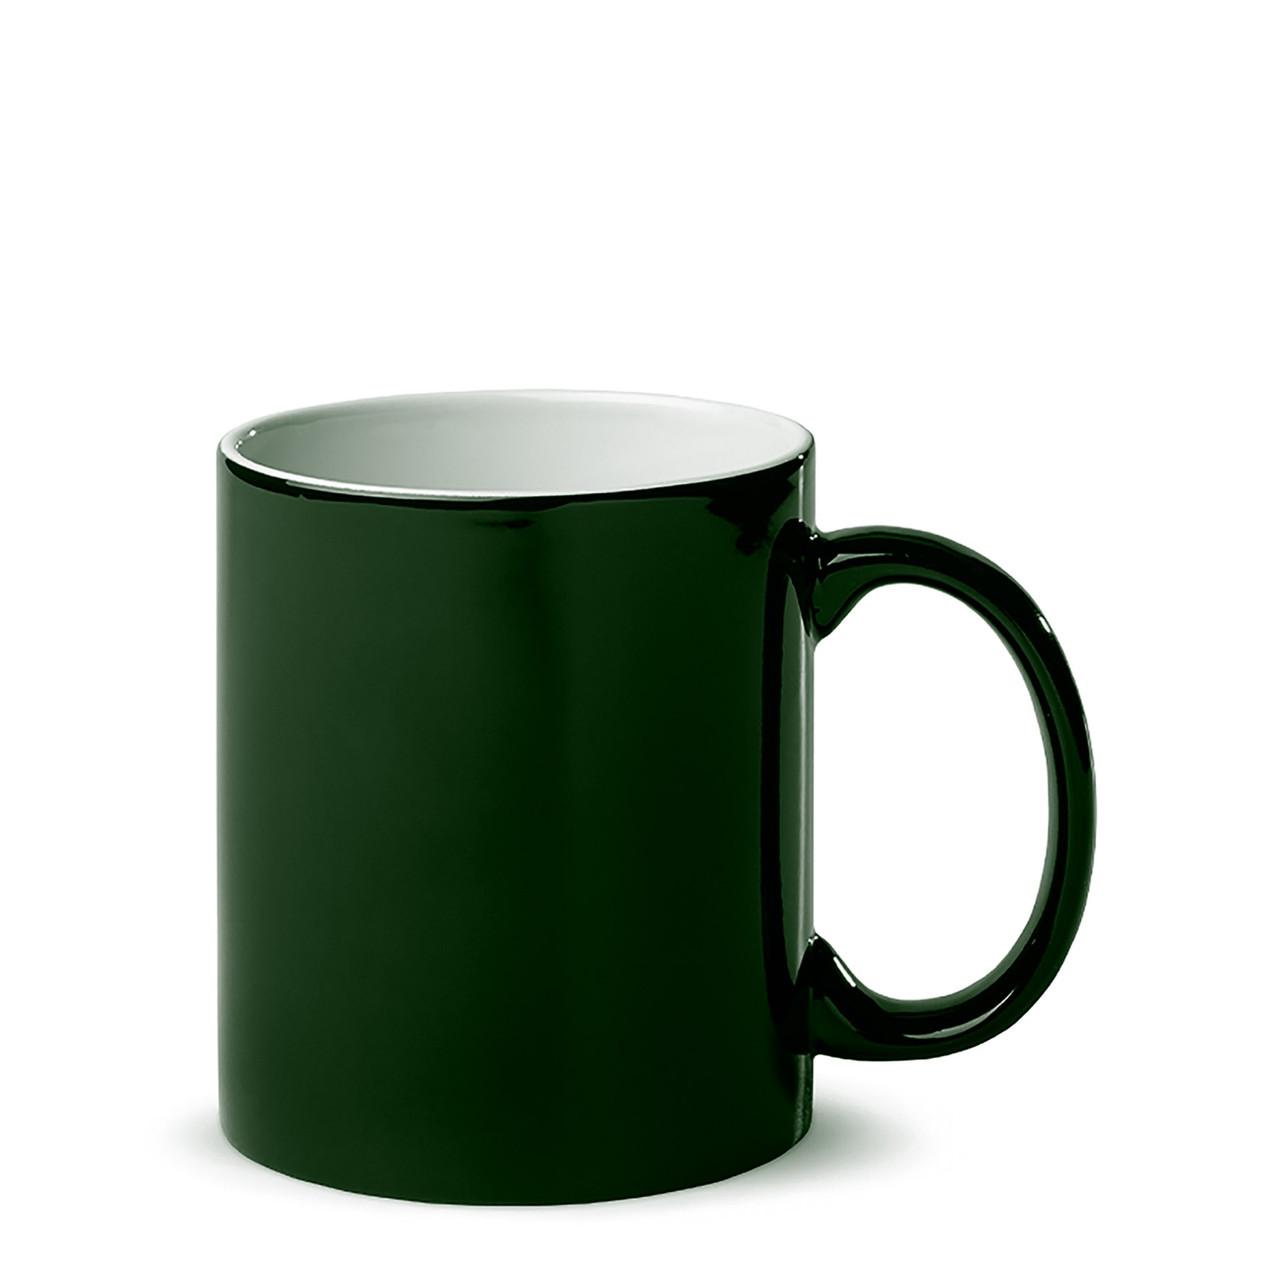 Чашка для сублимации хамелеон ГЛЯНЕЦ 330 мл (зеленый)